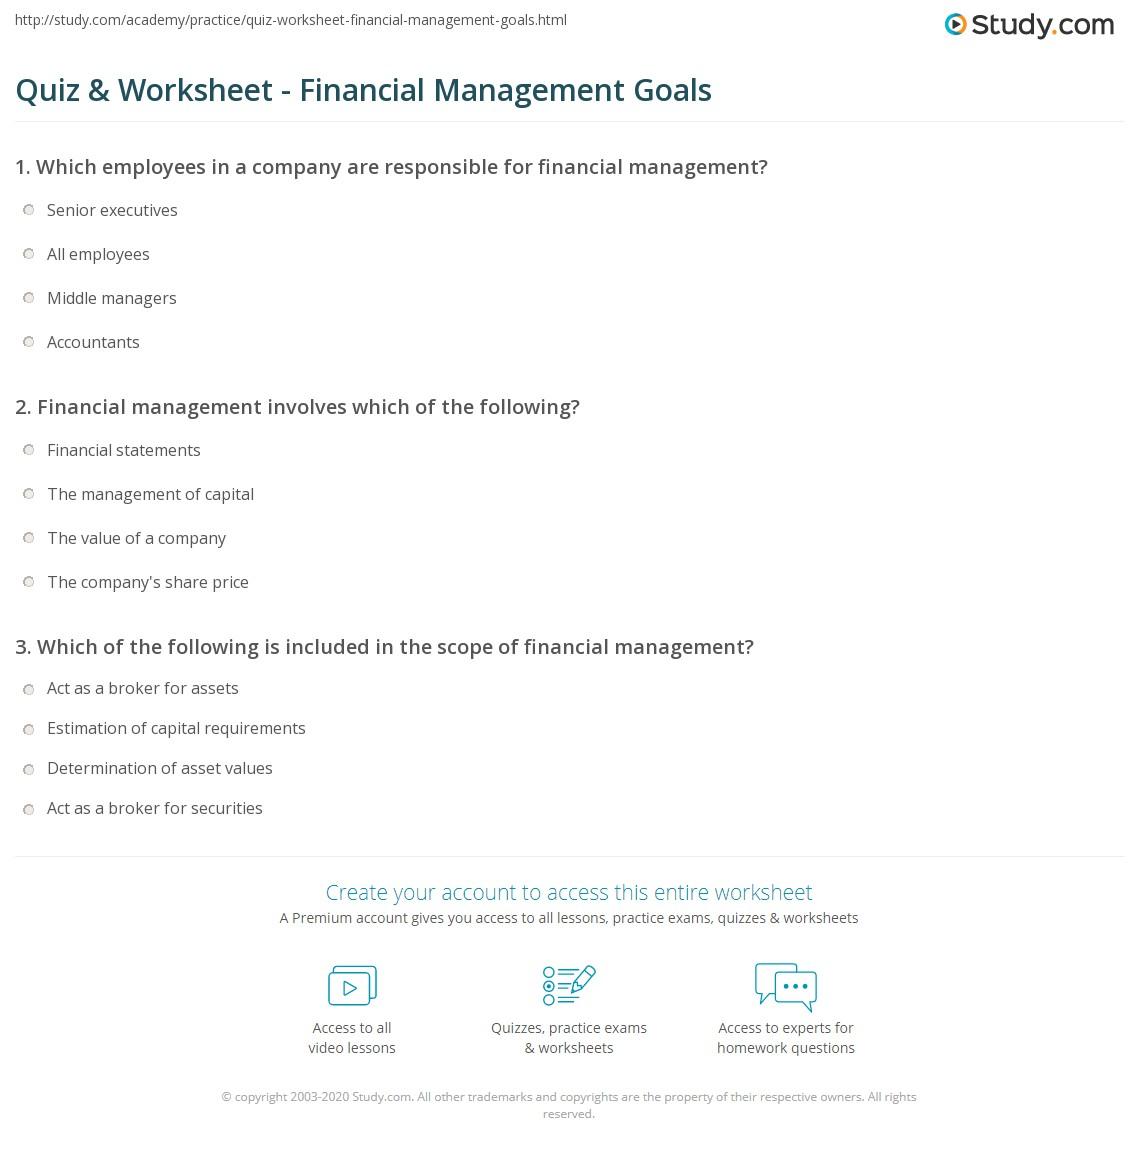 Worksheets Short Sale Financial Worksheet quiz worksheet financial management goals study com print what are the of worksheet